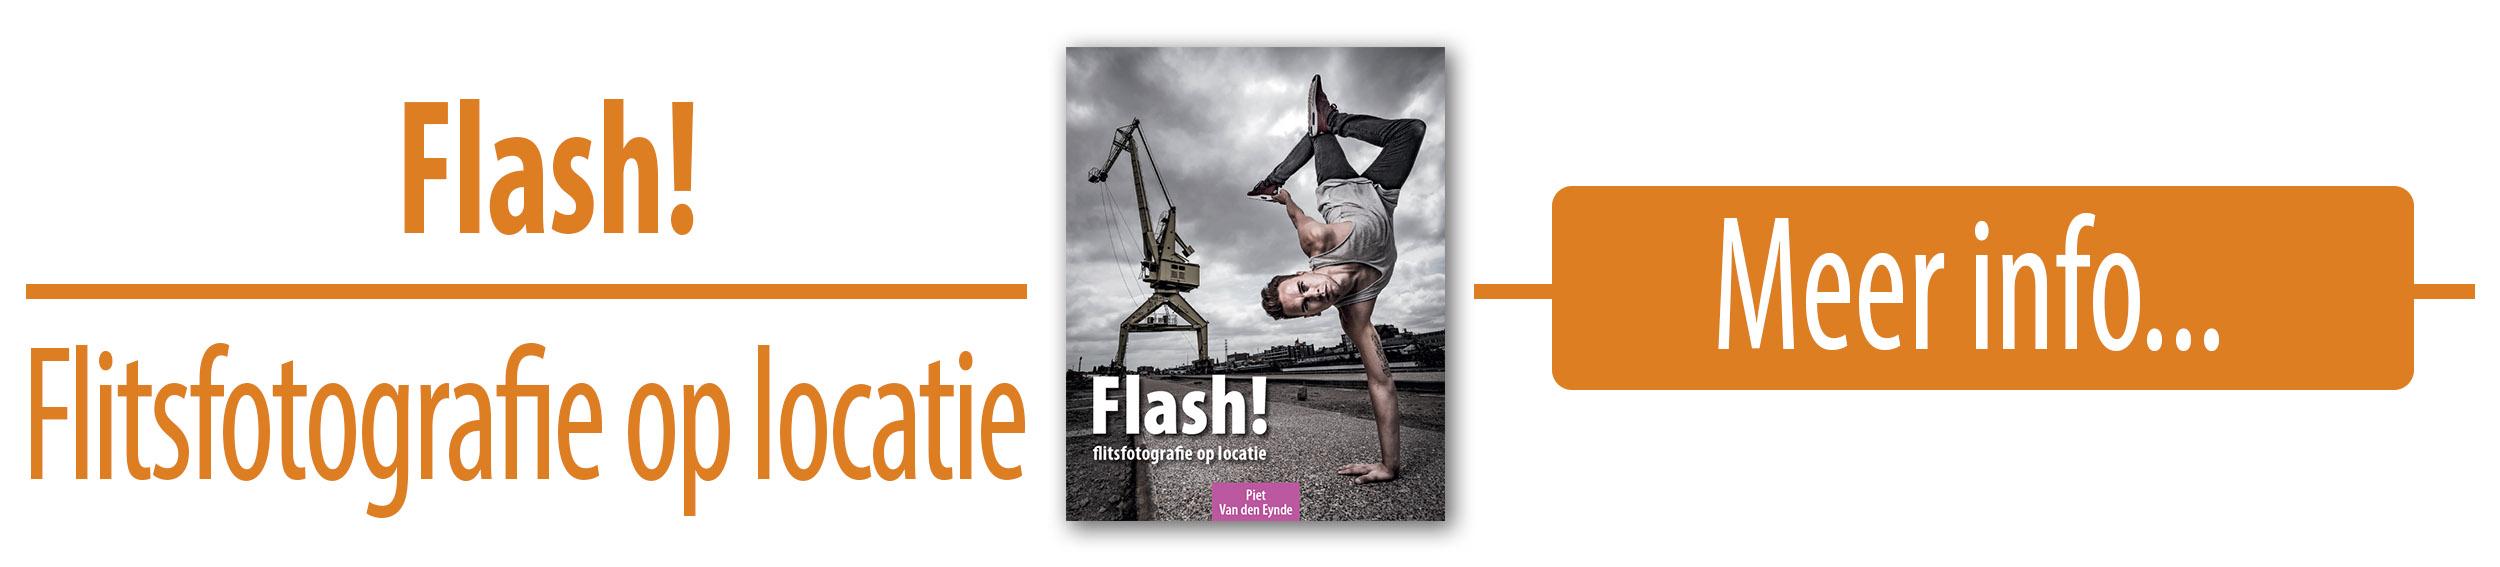 FlashBanner.jpg